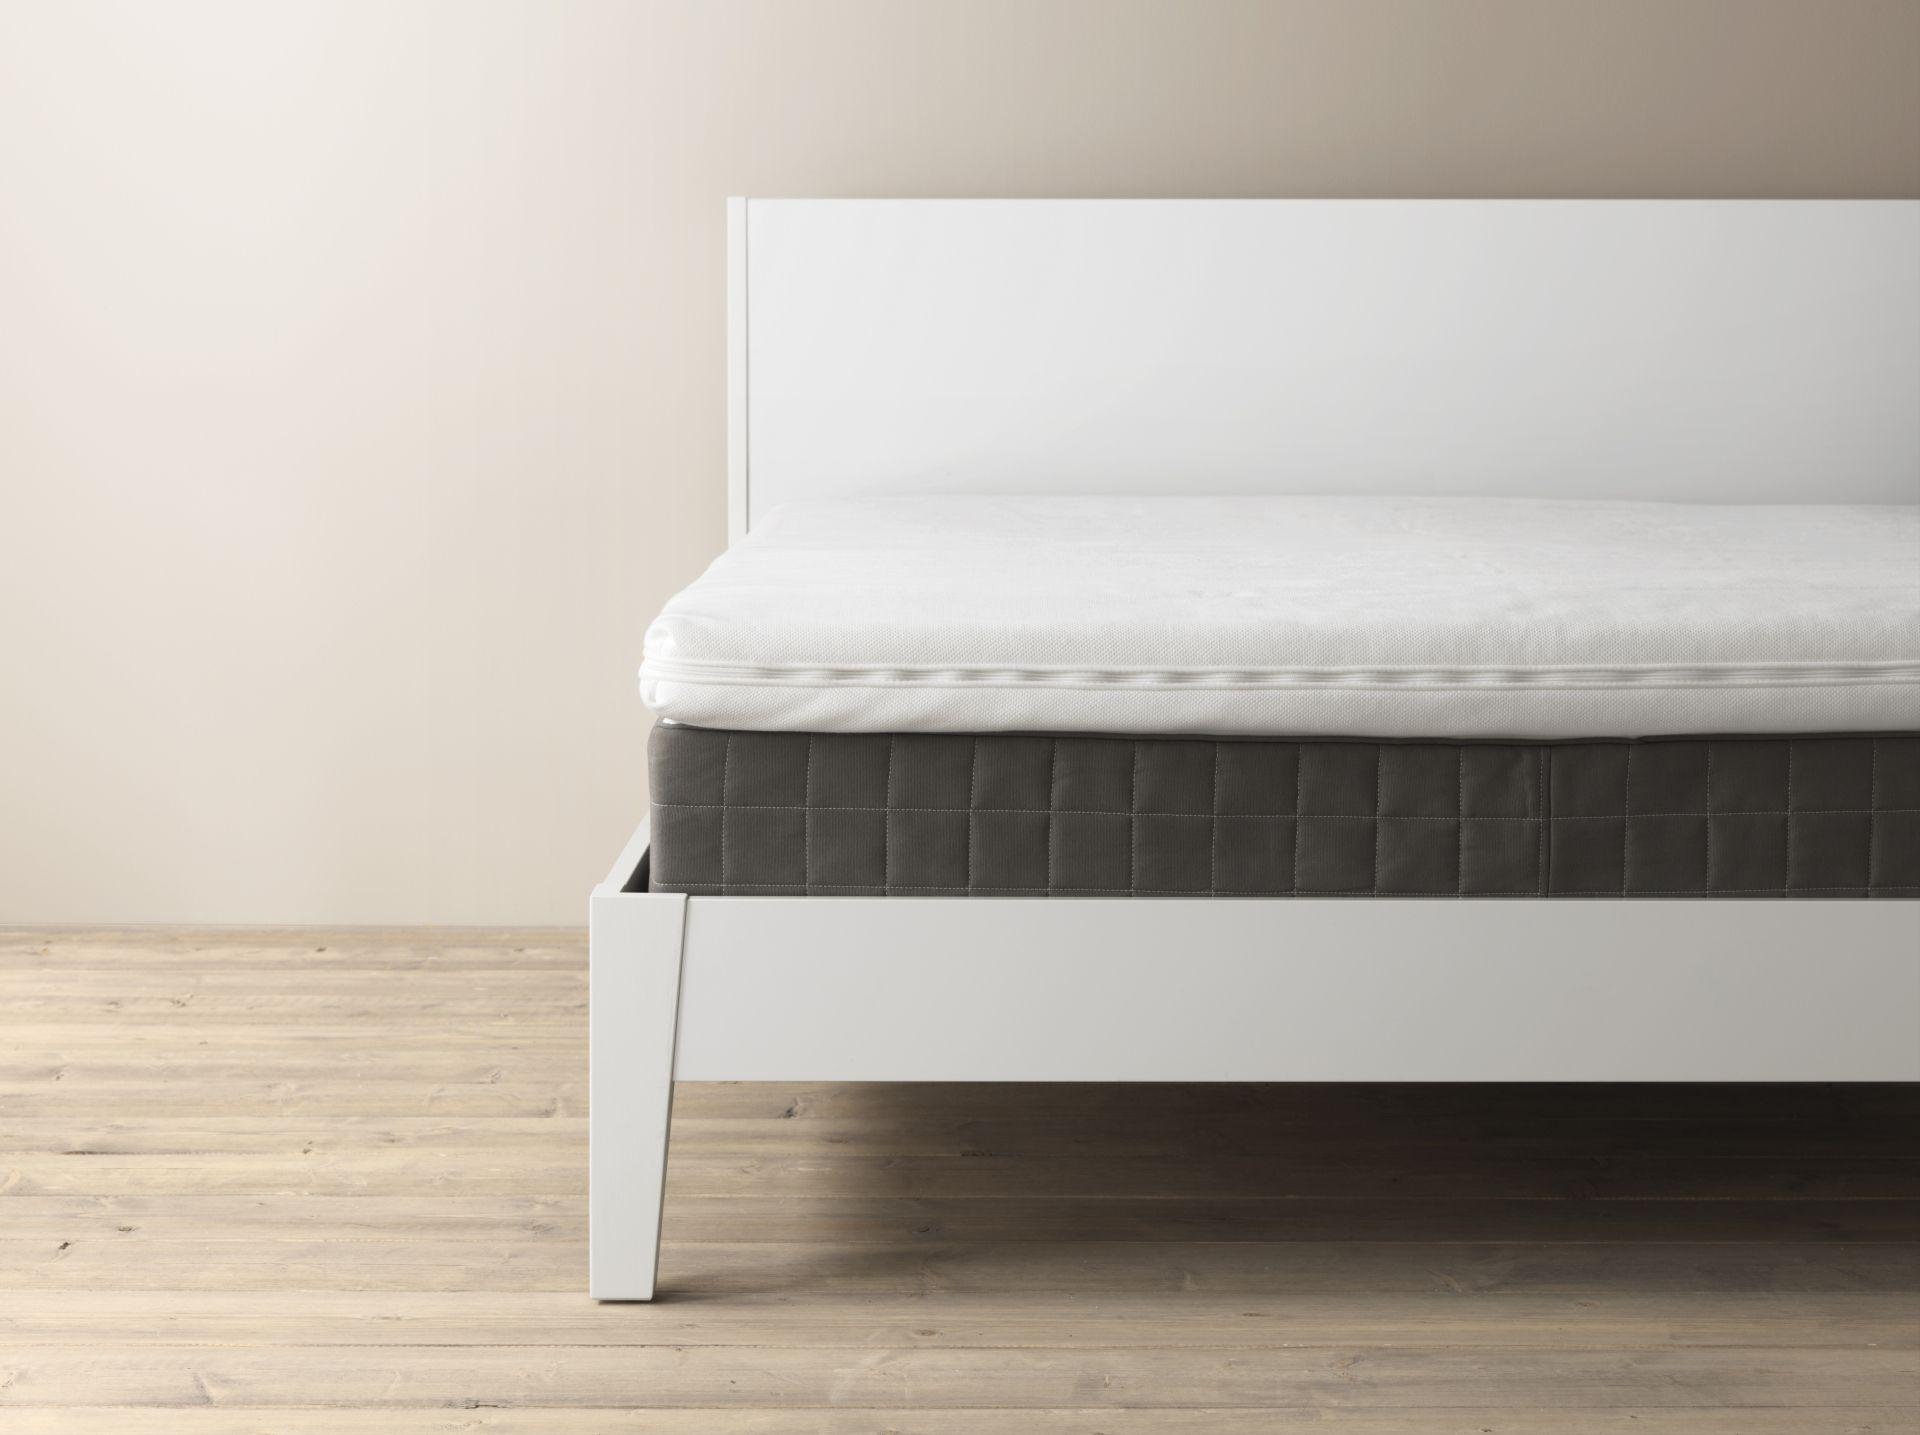 interesting malfors foammatras nieuw ikea ikeanl slapen slaapkamer onstpannen matras foam steun. Black Bedroom Furniture Sets. Home Design Ideas